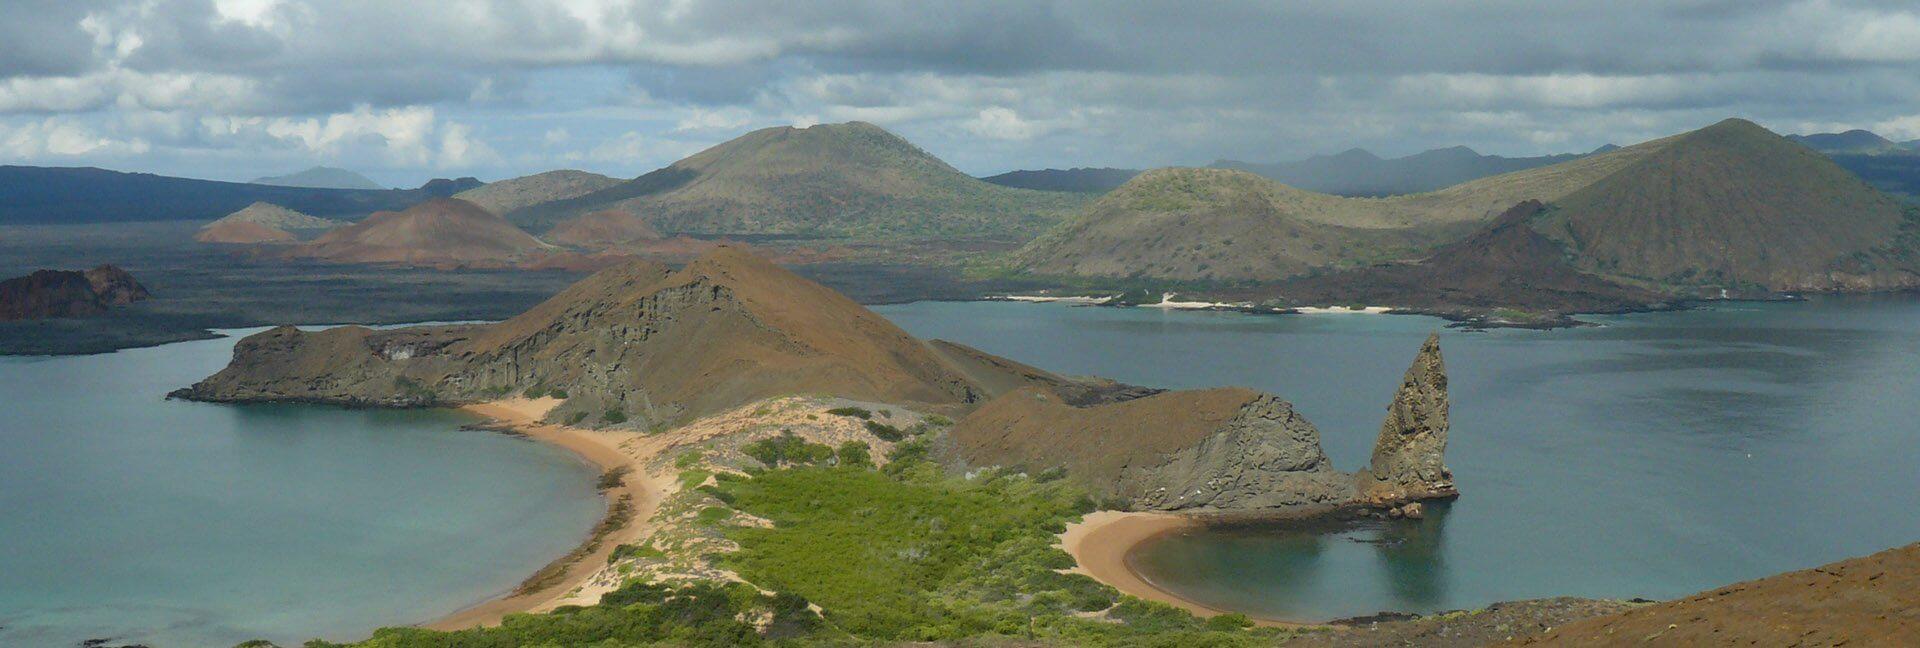 Galapagos Inseln - Bartholomé